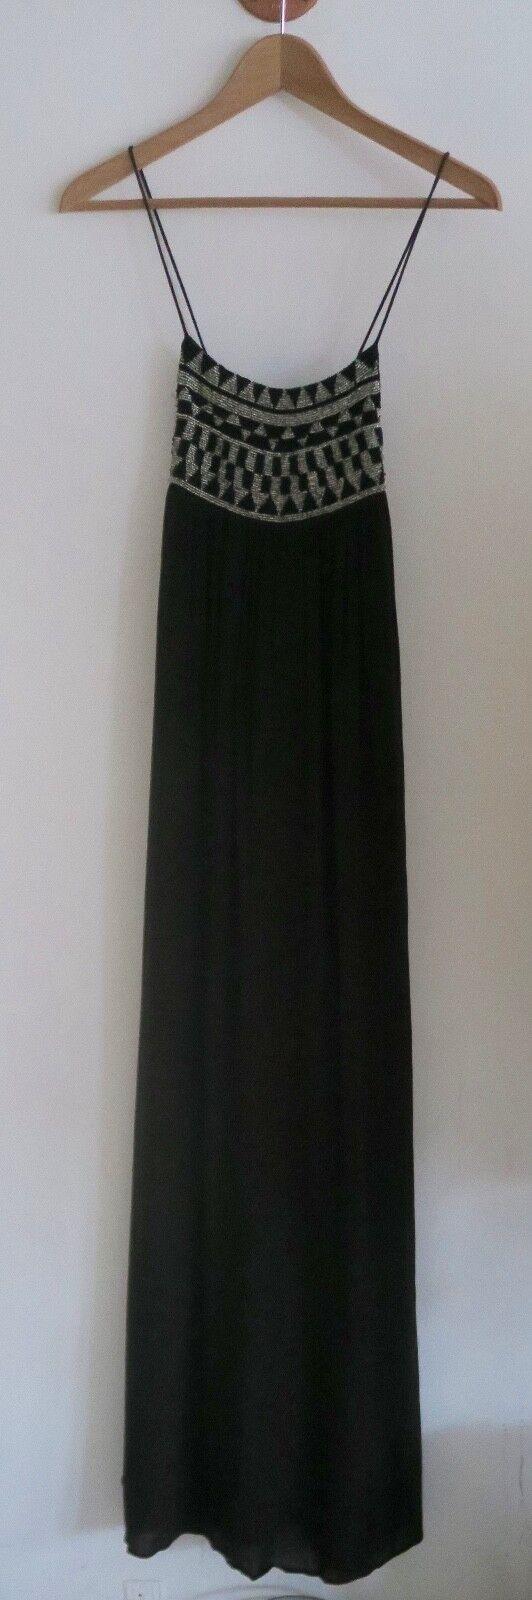 Amuse Society Blac Long Boho Dress size size size S 1899ca